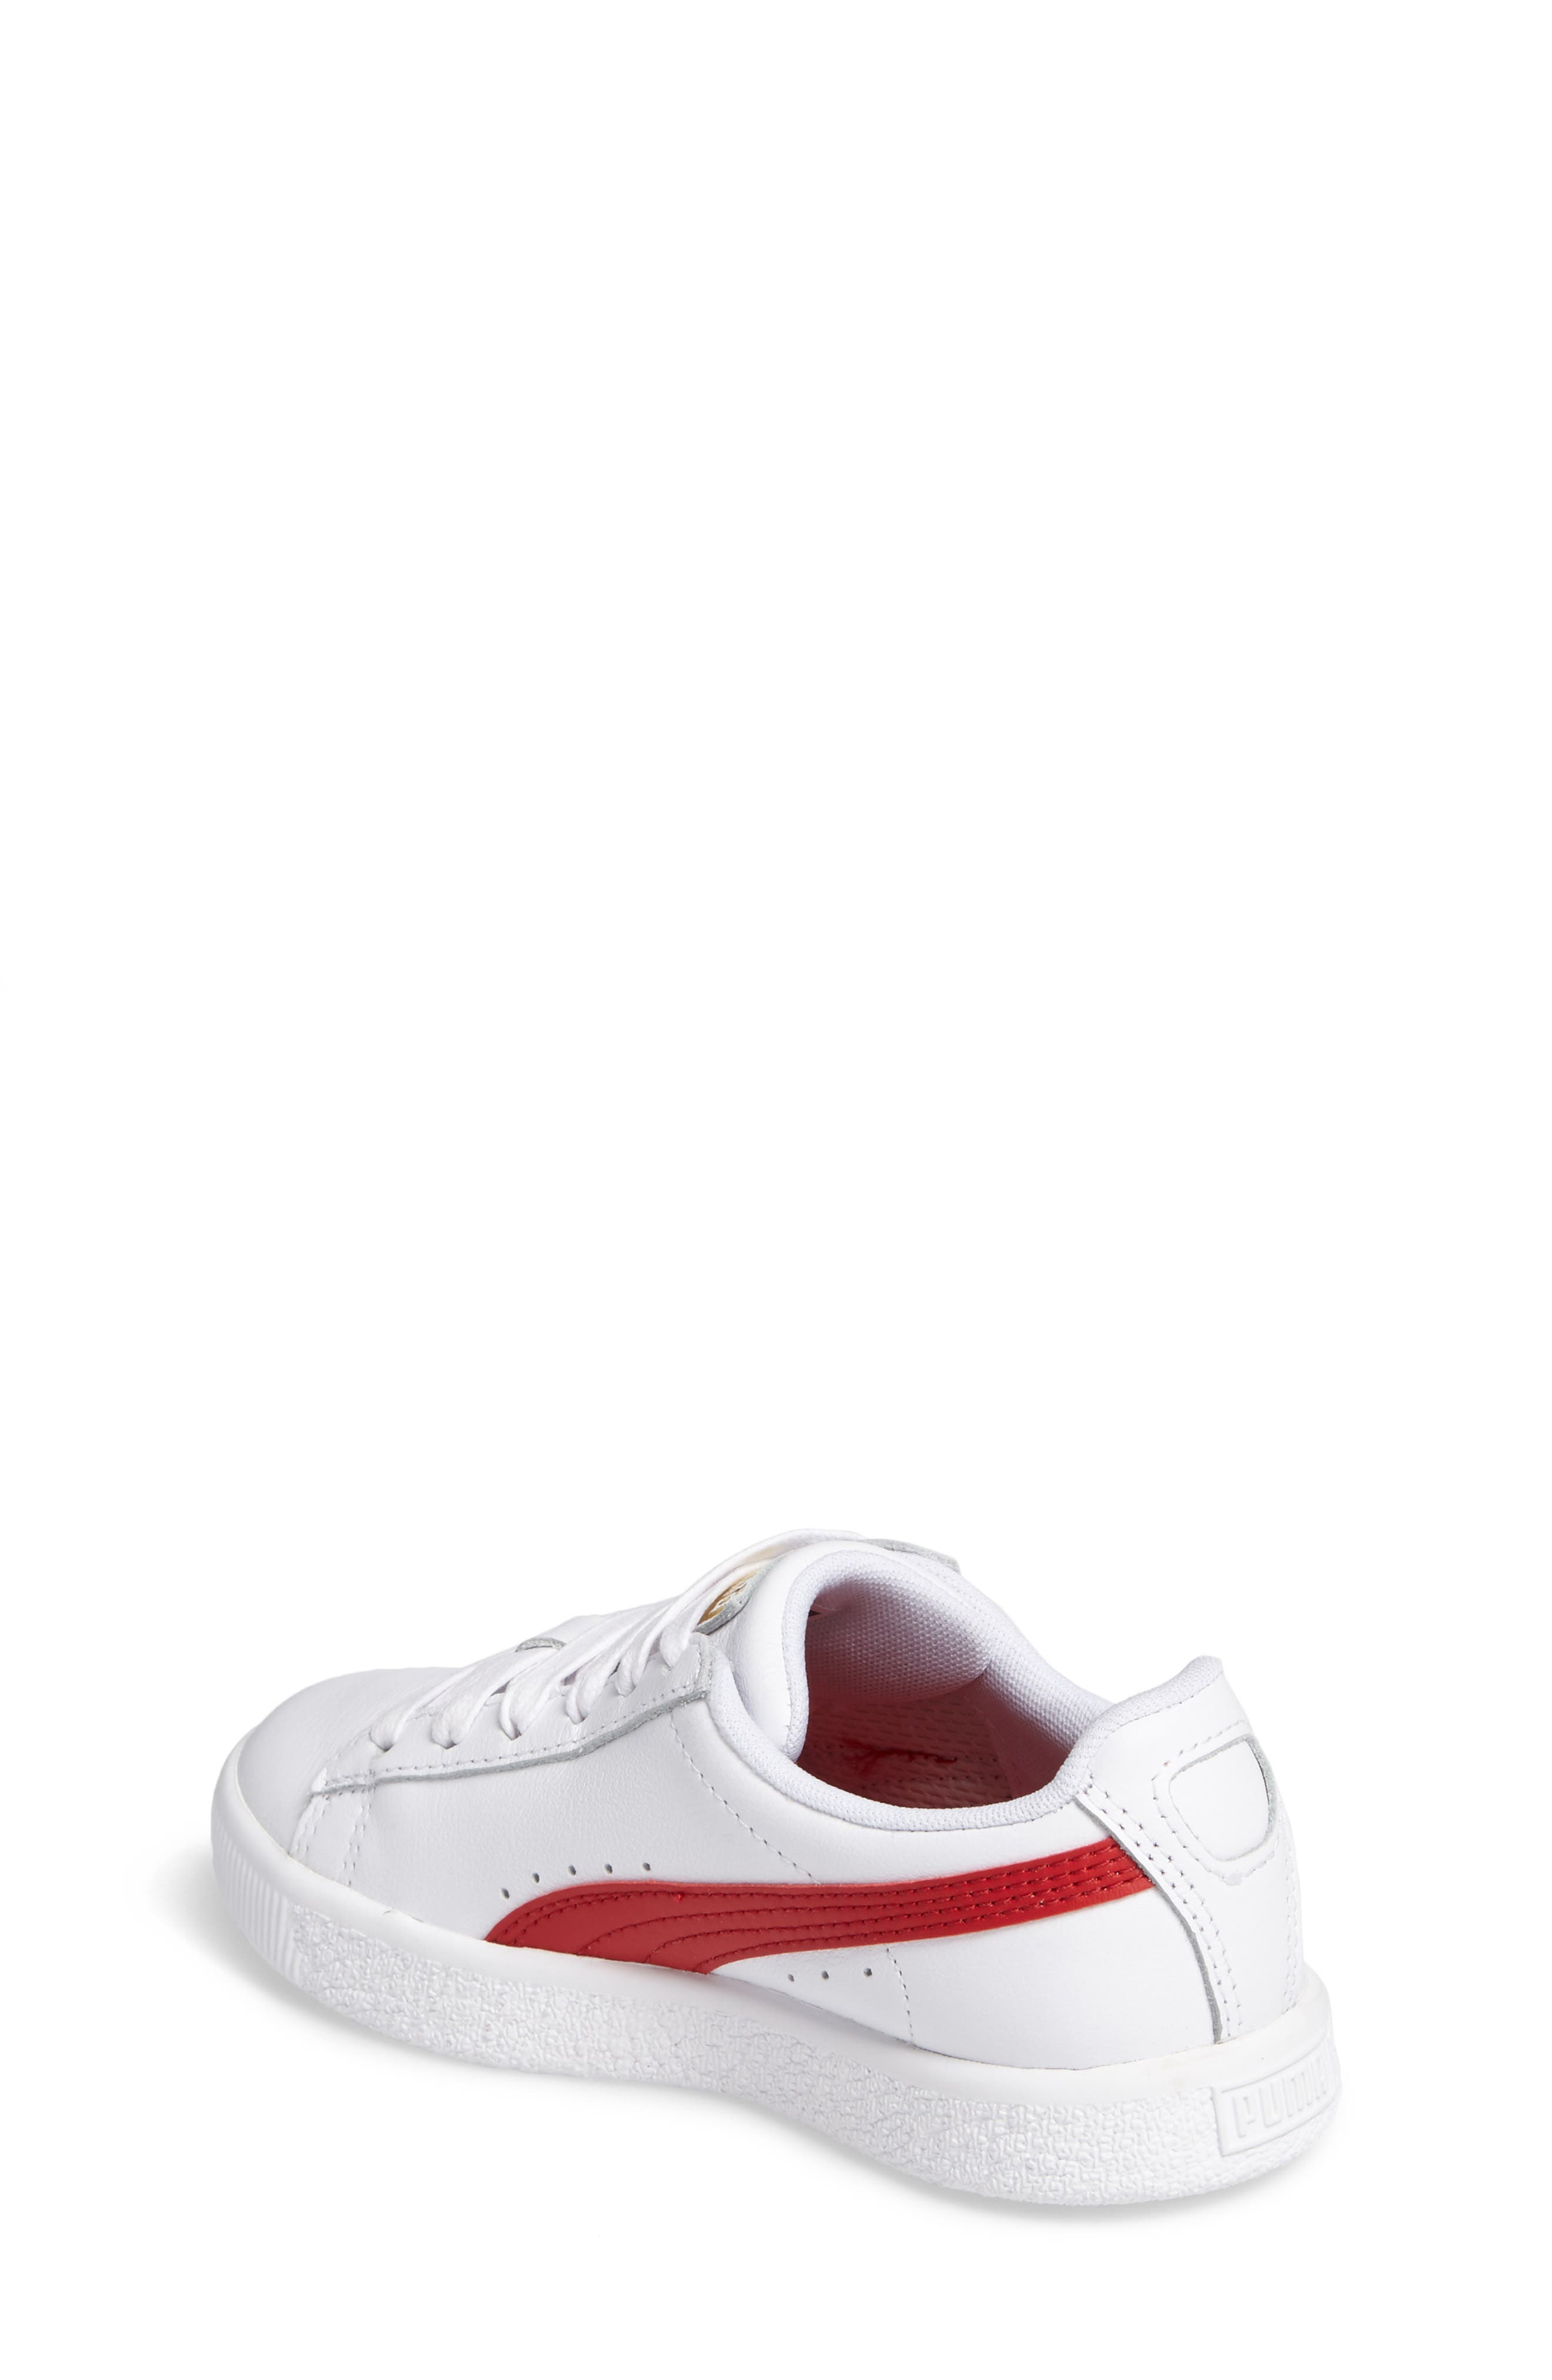 Clyde Core Foil Sneaker,                             Alternate thumbnail 2, color,                             White/ Cherry